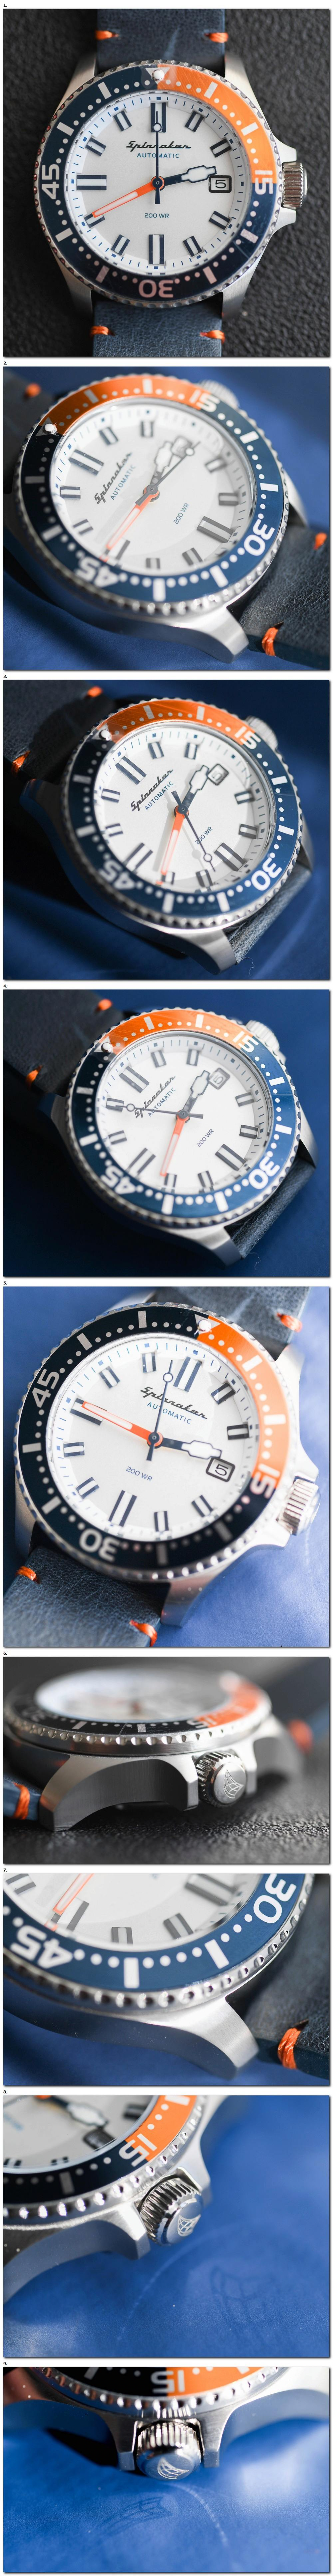 Les montres Spinnaker de Dartmouth Brands / Solar time limited – Hong Kong. 2018-016